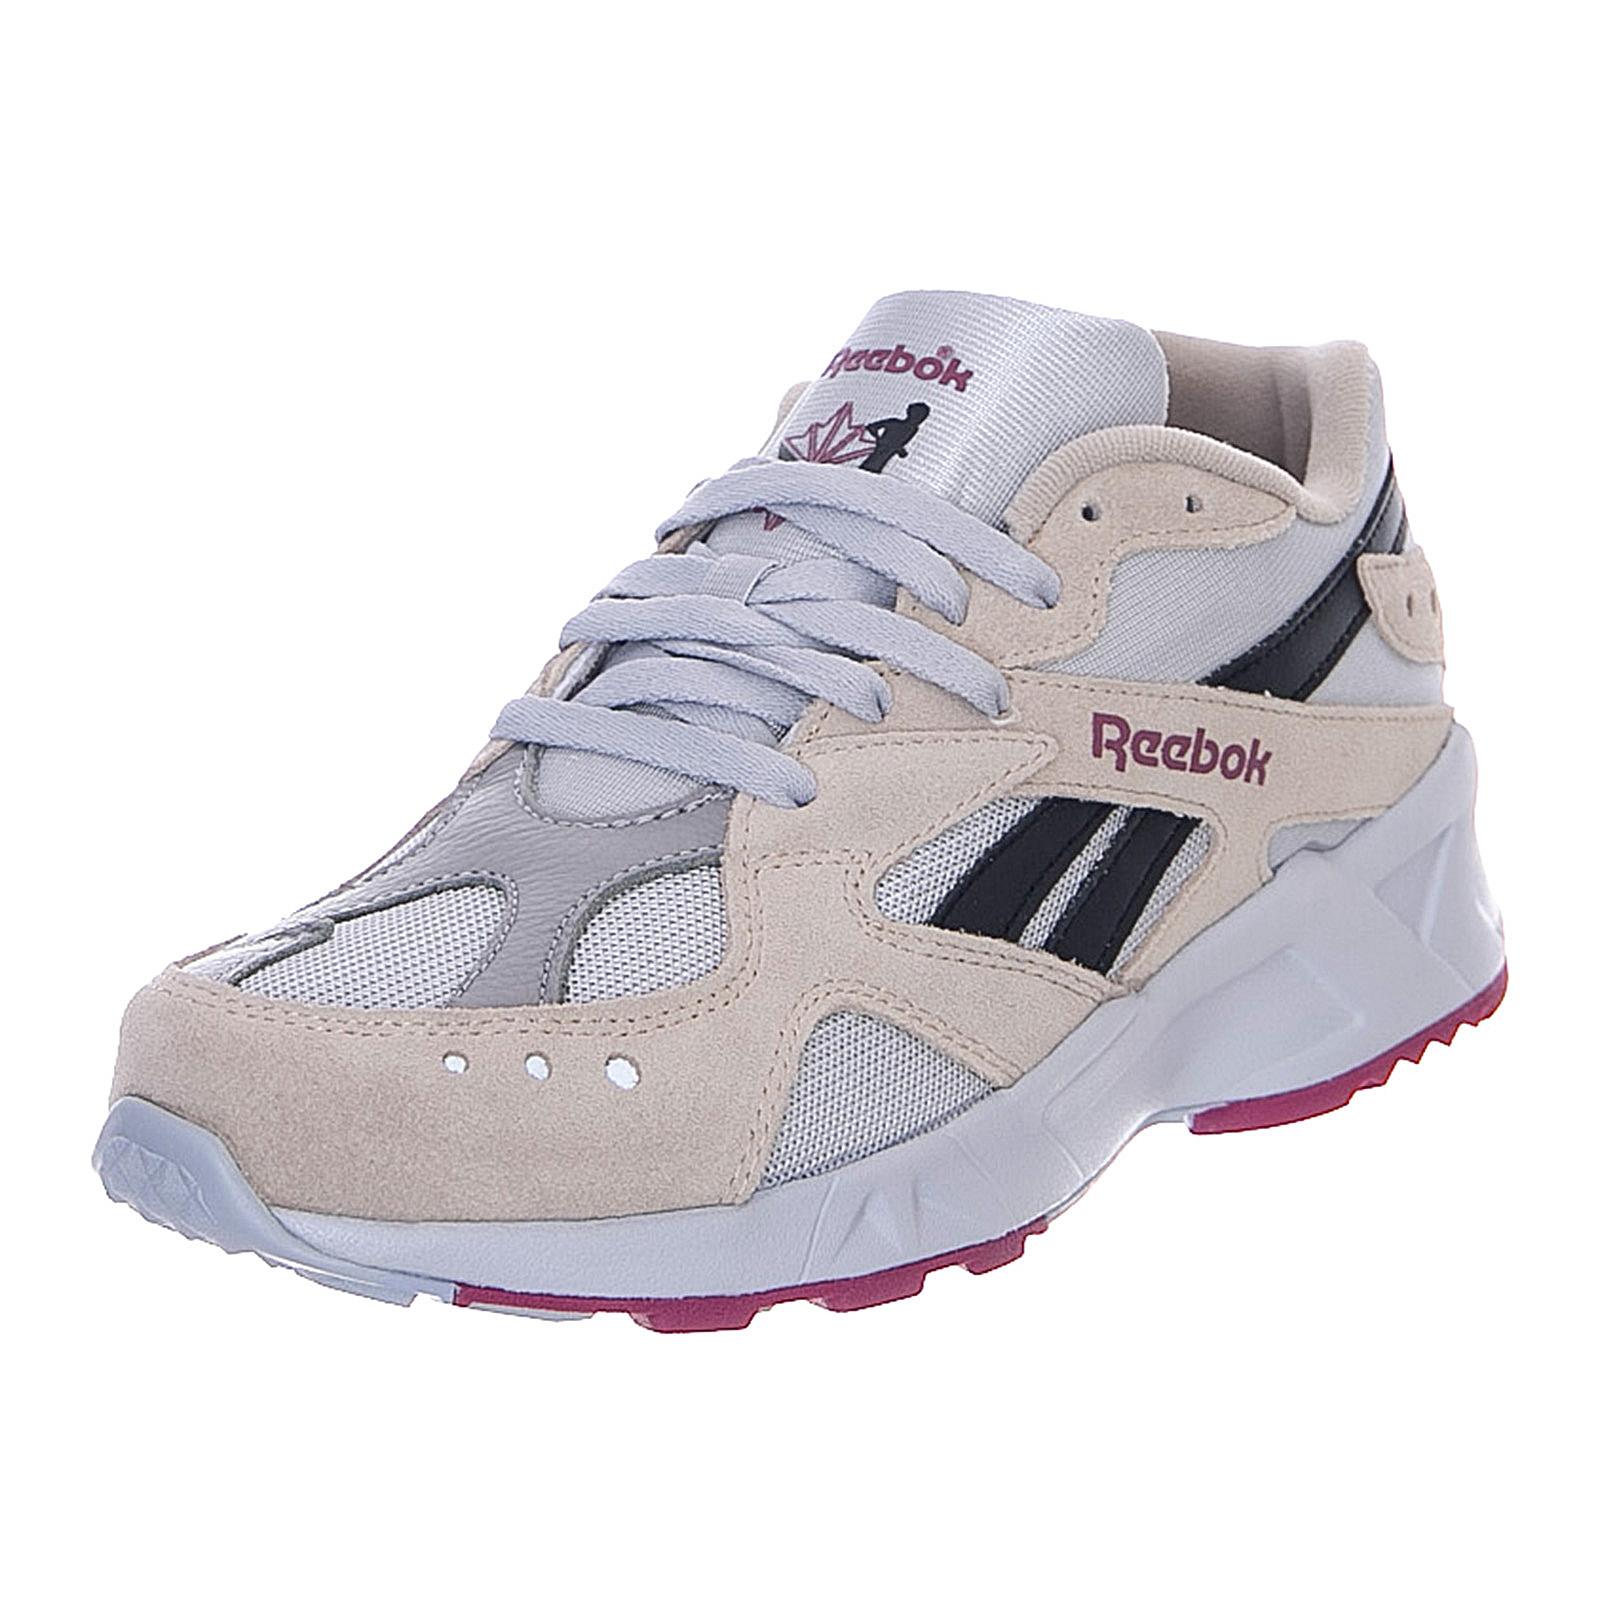 new arrival a9192 b0de0 Details about Reebok Aztrek - Cold Grey/Sand/Powder grey/Baked Clay/Black -  High Sneakers Man